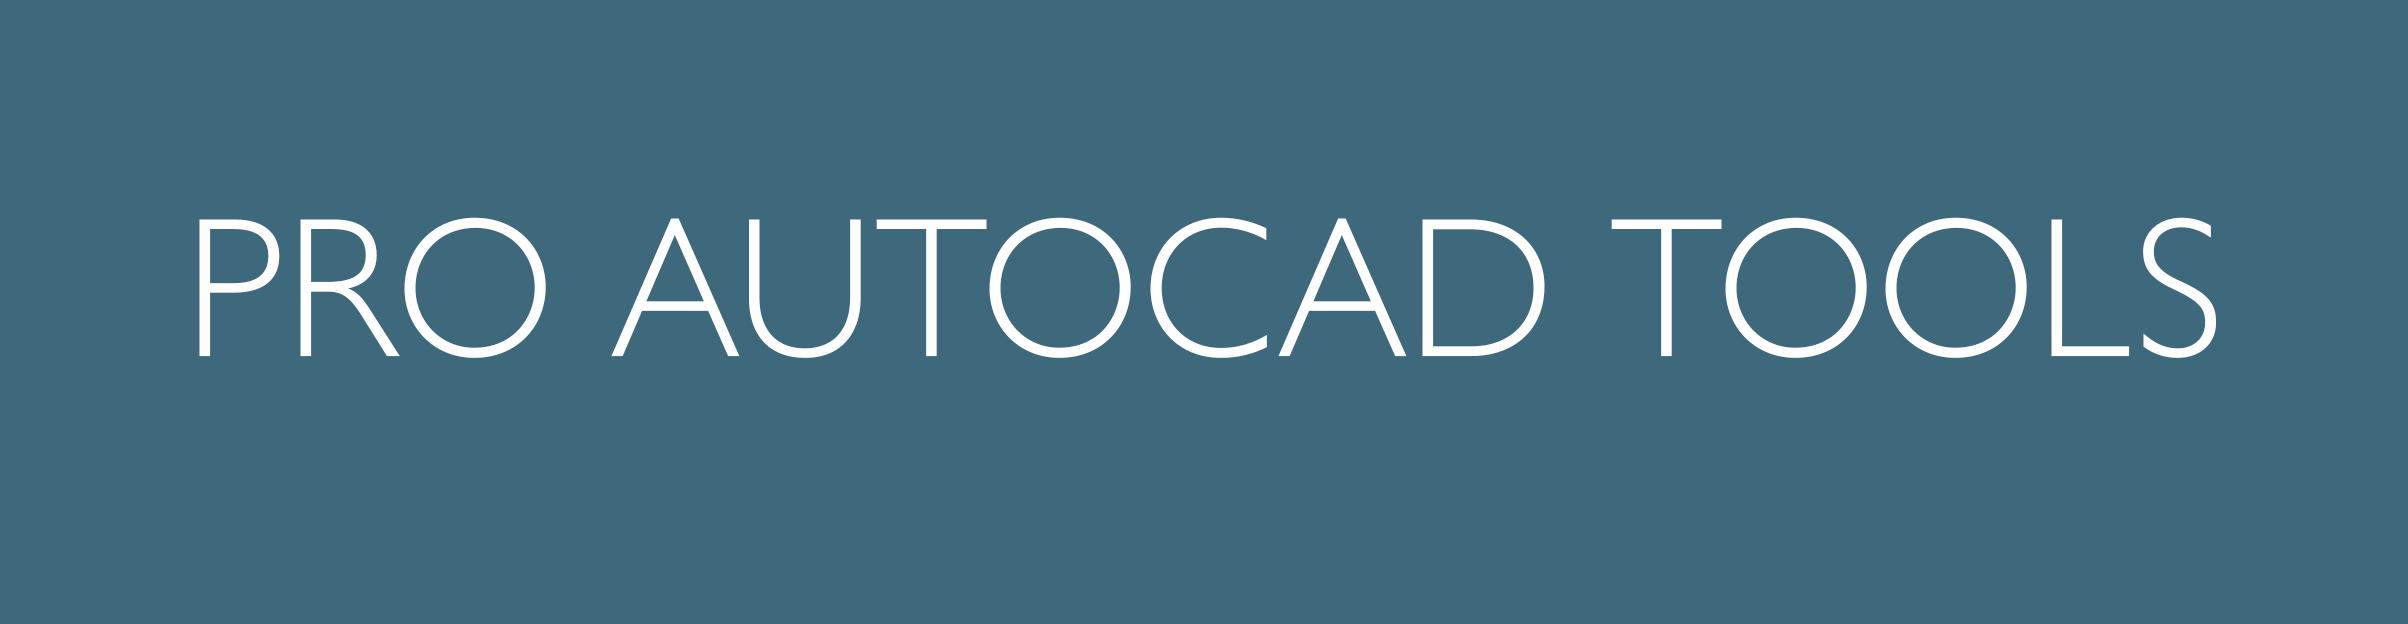 Pro AutoCAD Tools Button